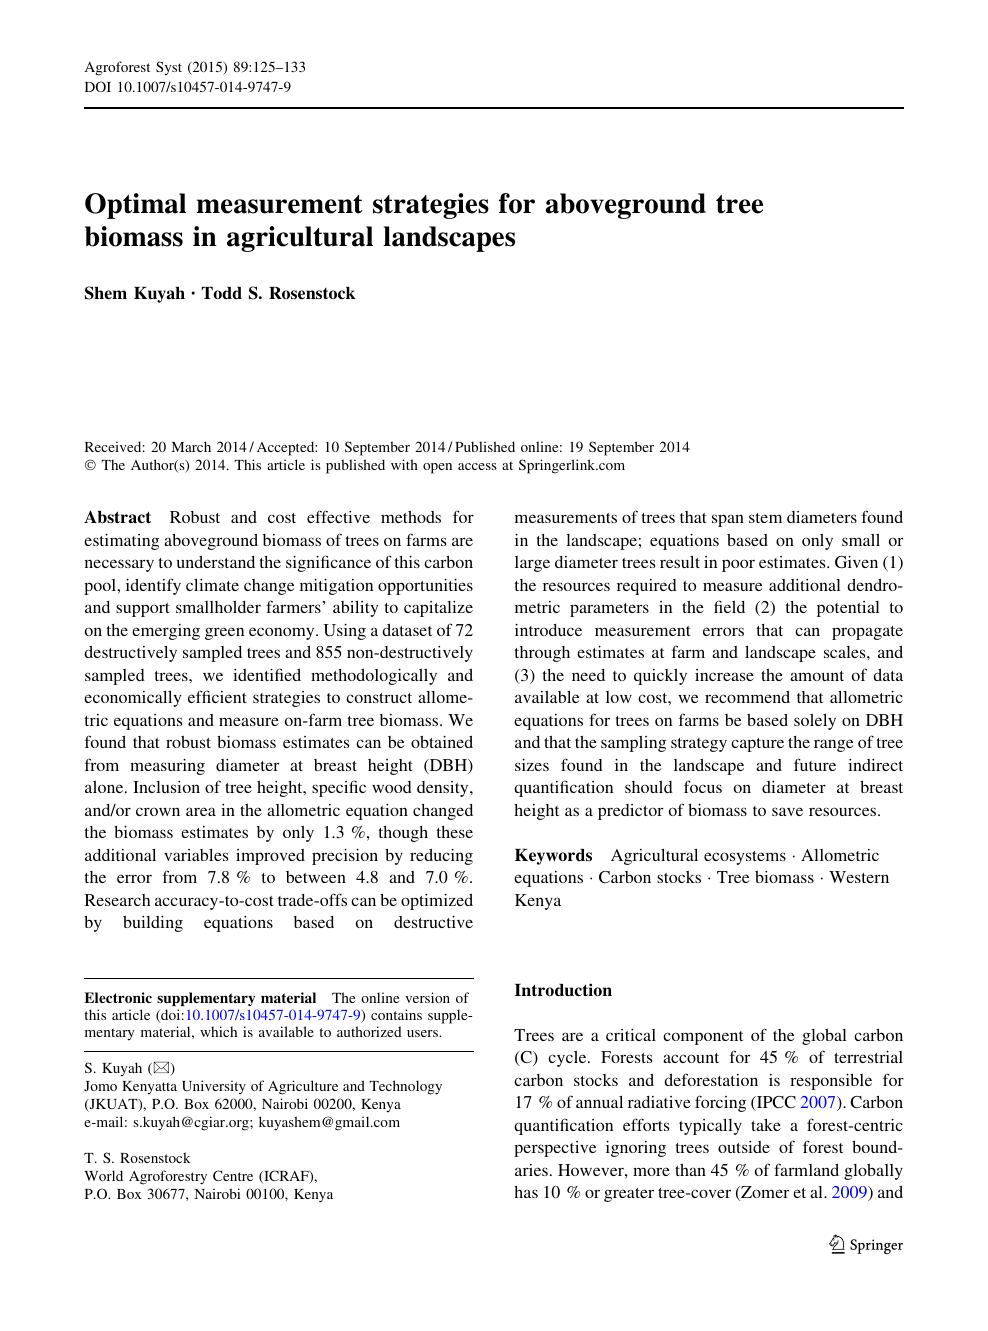 Optimal measurement strategies for aboveground tree biomass